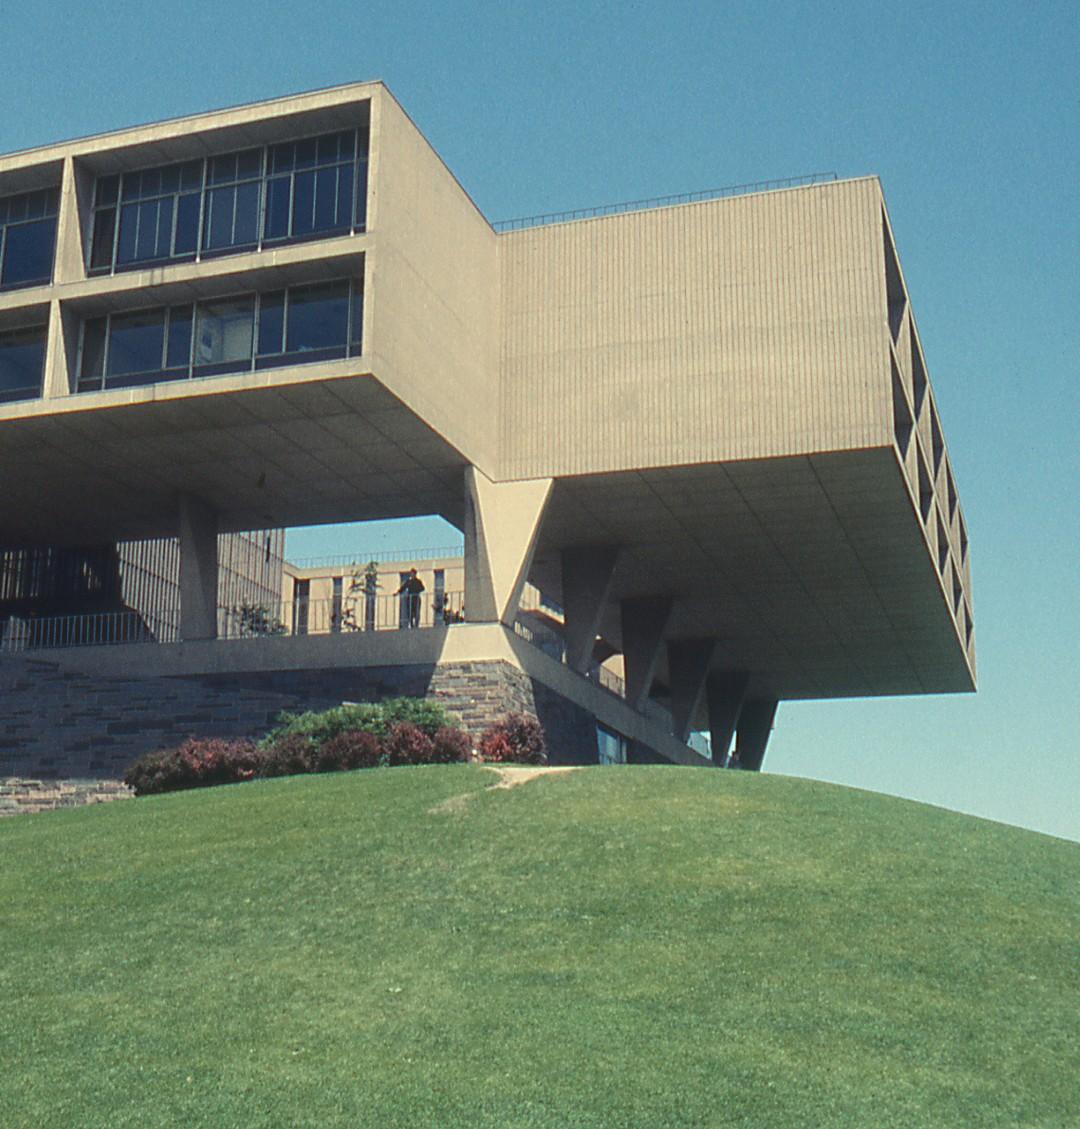 Milwaukee Art Center, Saarinen building, 1957. Milwaukee Art Museum, Institutional Archives.